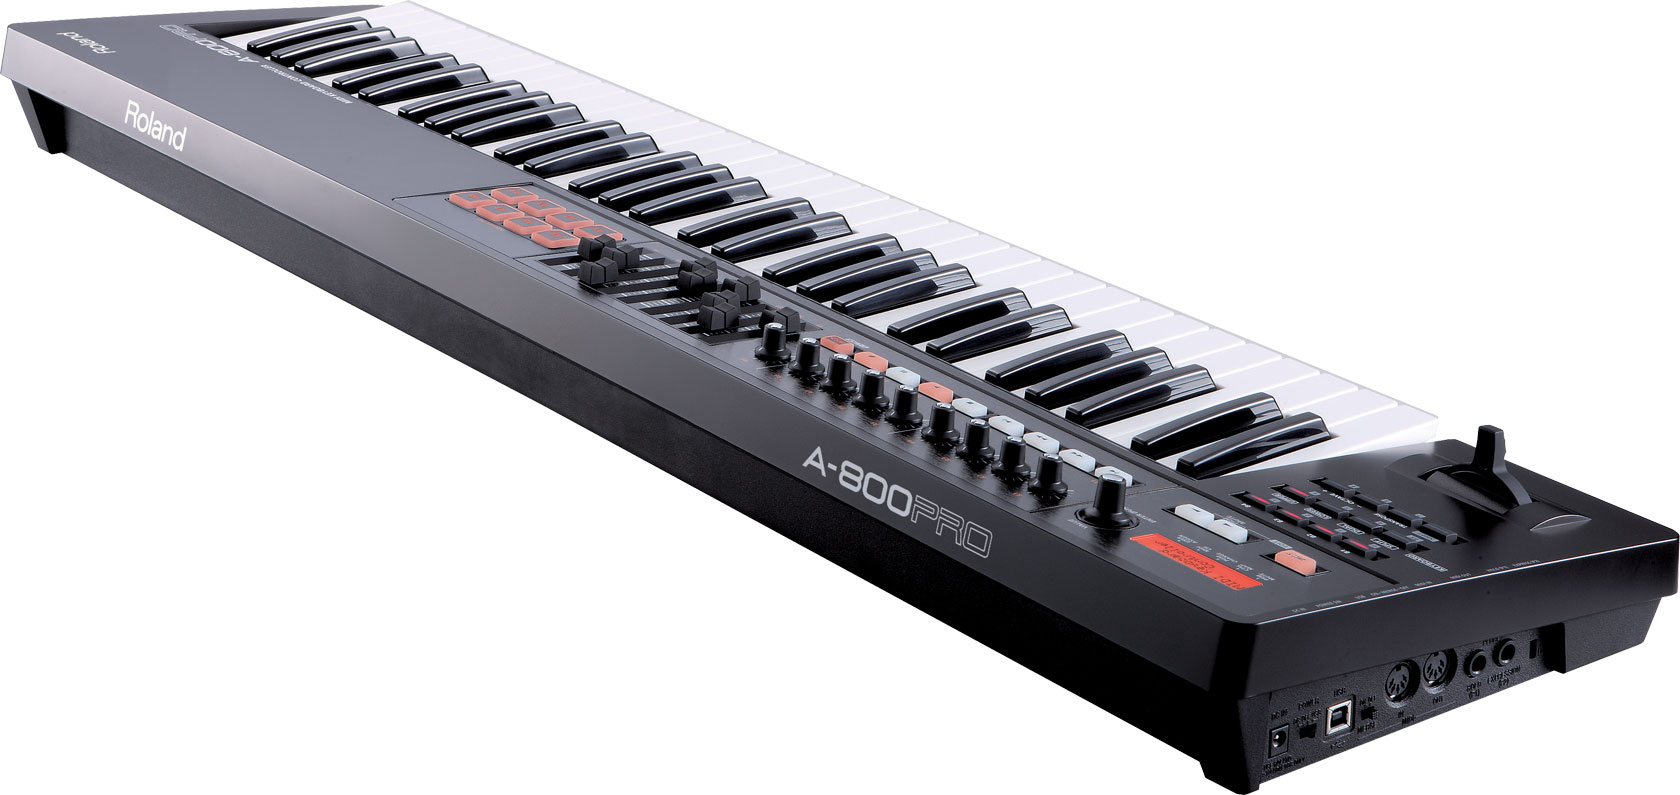 roland a 800pro midi keyboard controller. Black Bedroom Furniture Sets. Home Design Ideas